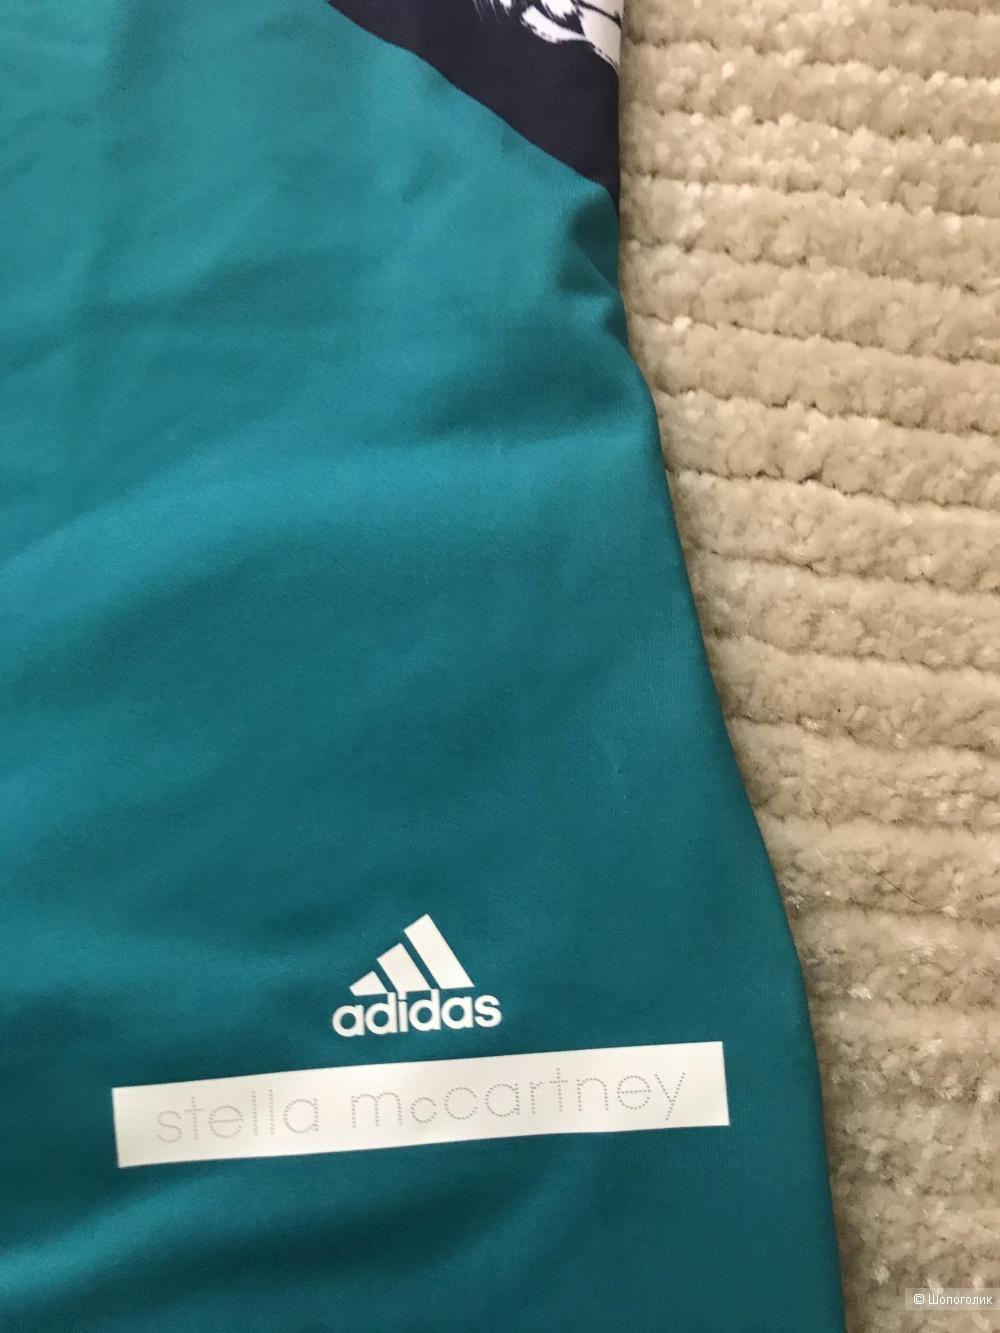 Майка  Adidas Stella Macartney размер S